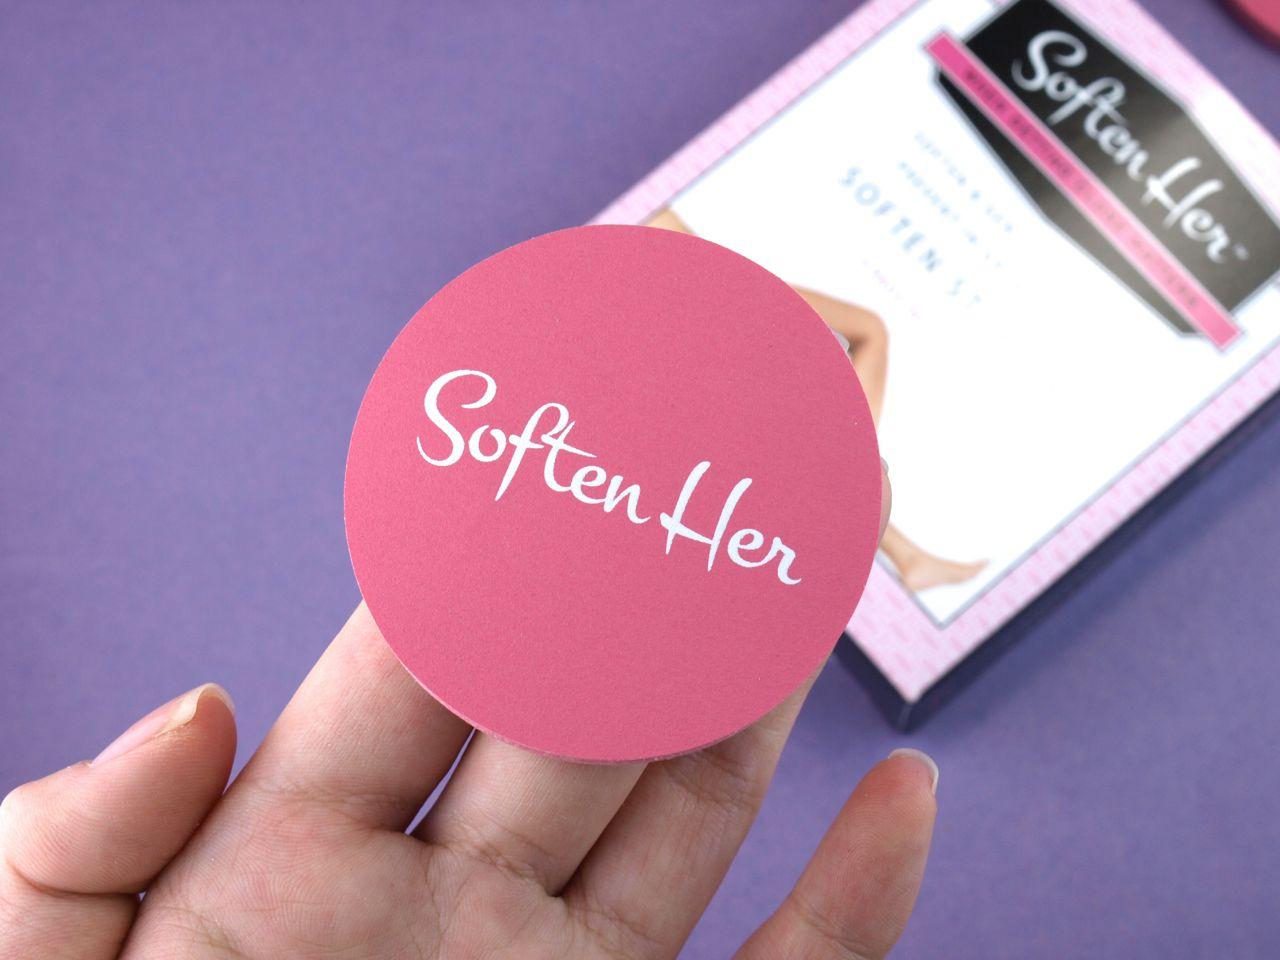 Soften Her Exfoliating Pads: Revew